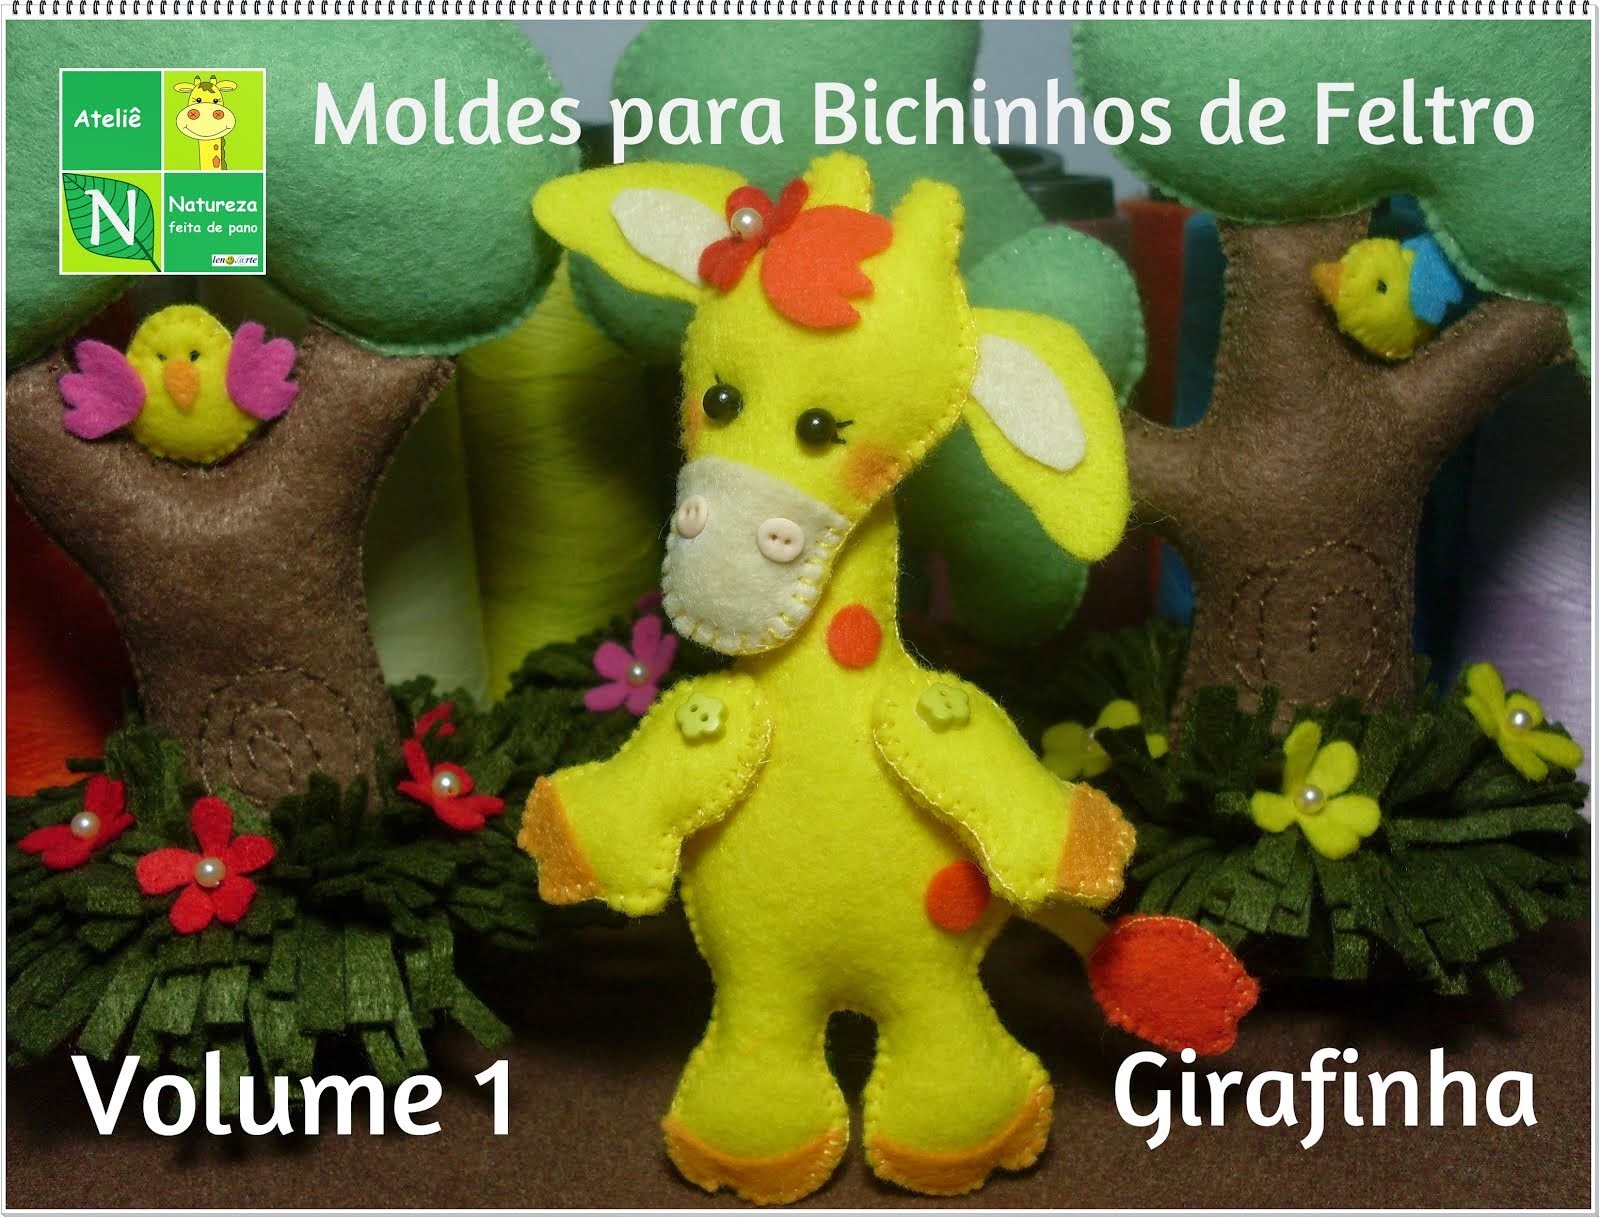 Apostila Digital/Moldes para Bichinhos de Feltro Volume 1 Girafinha